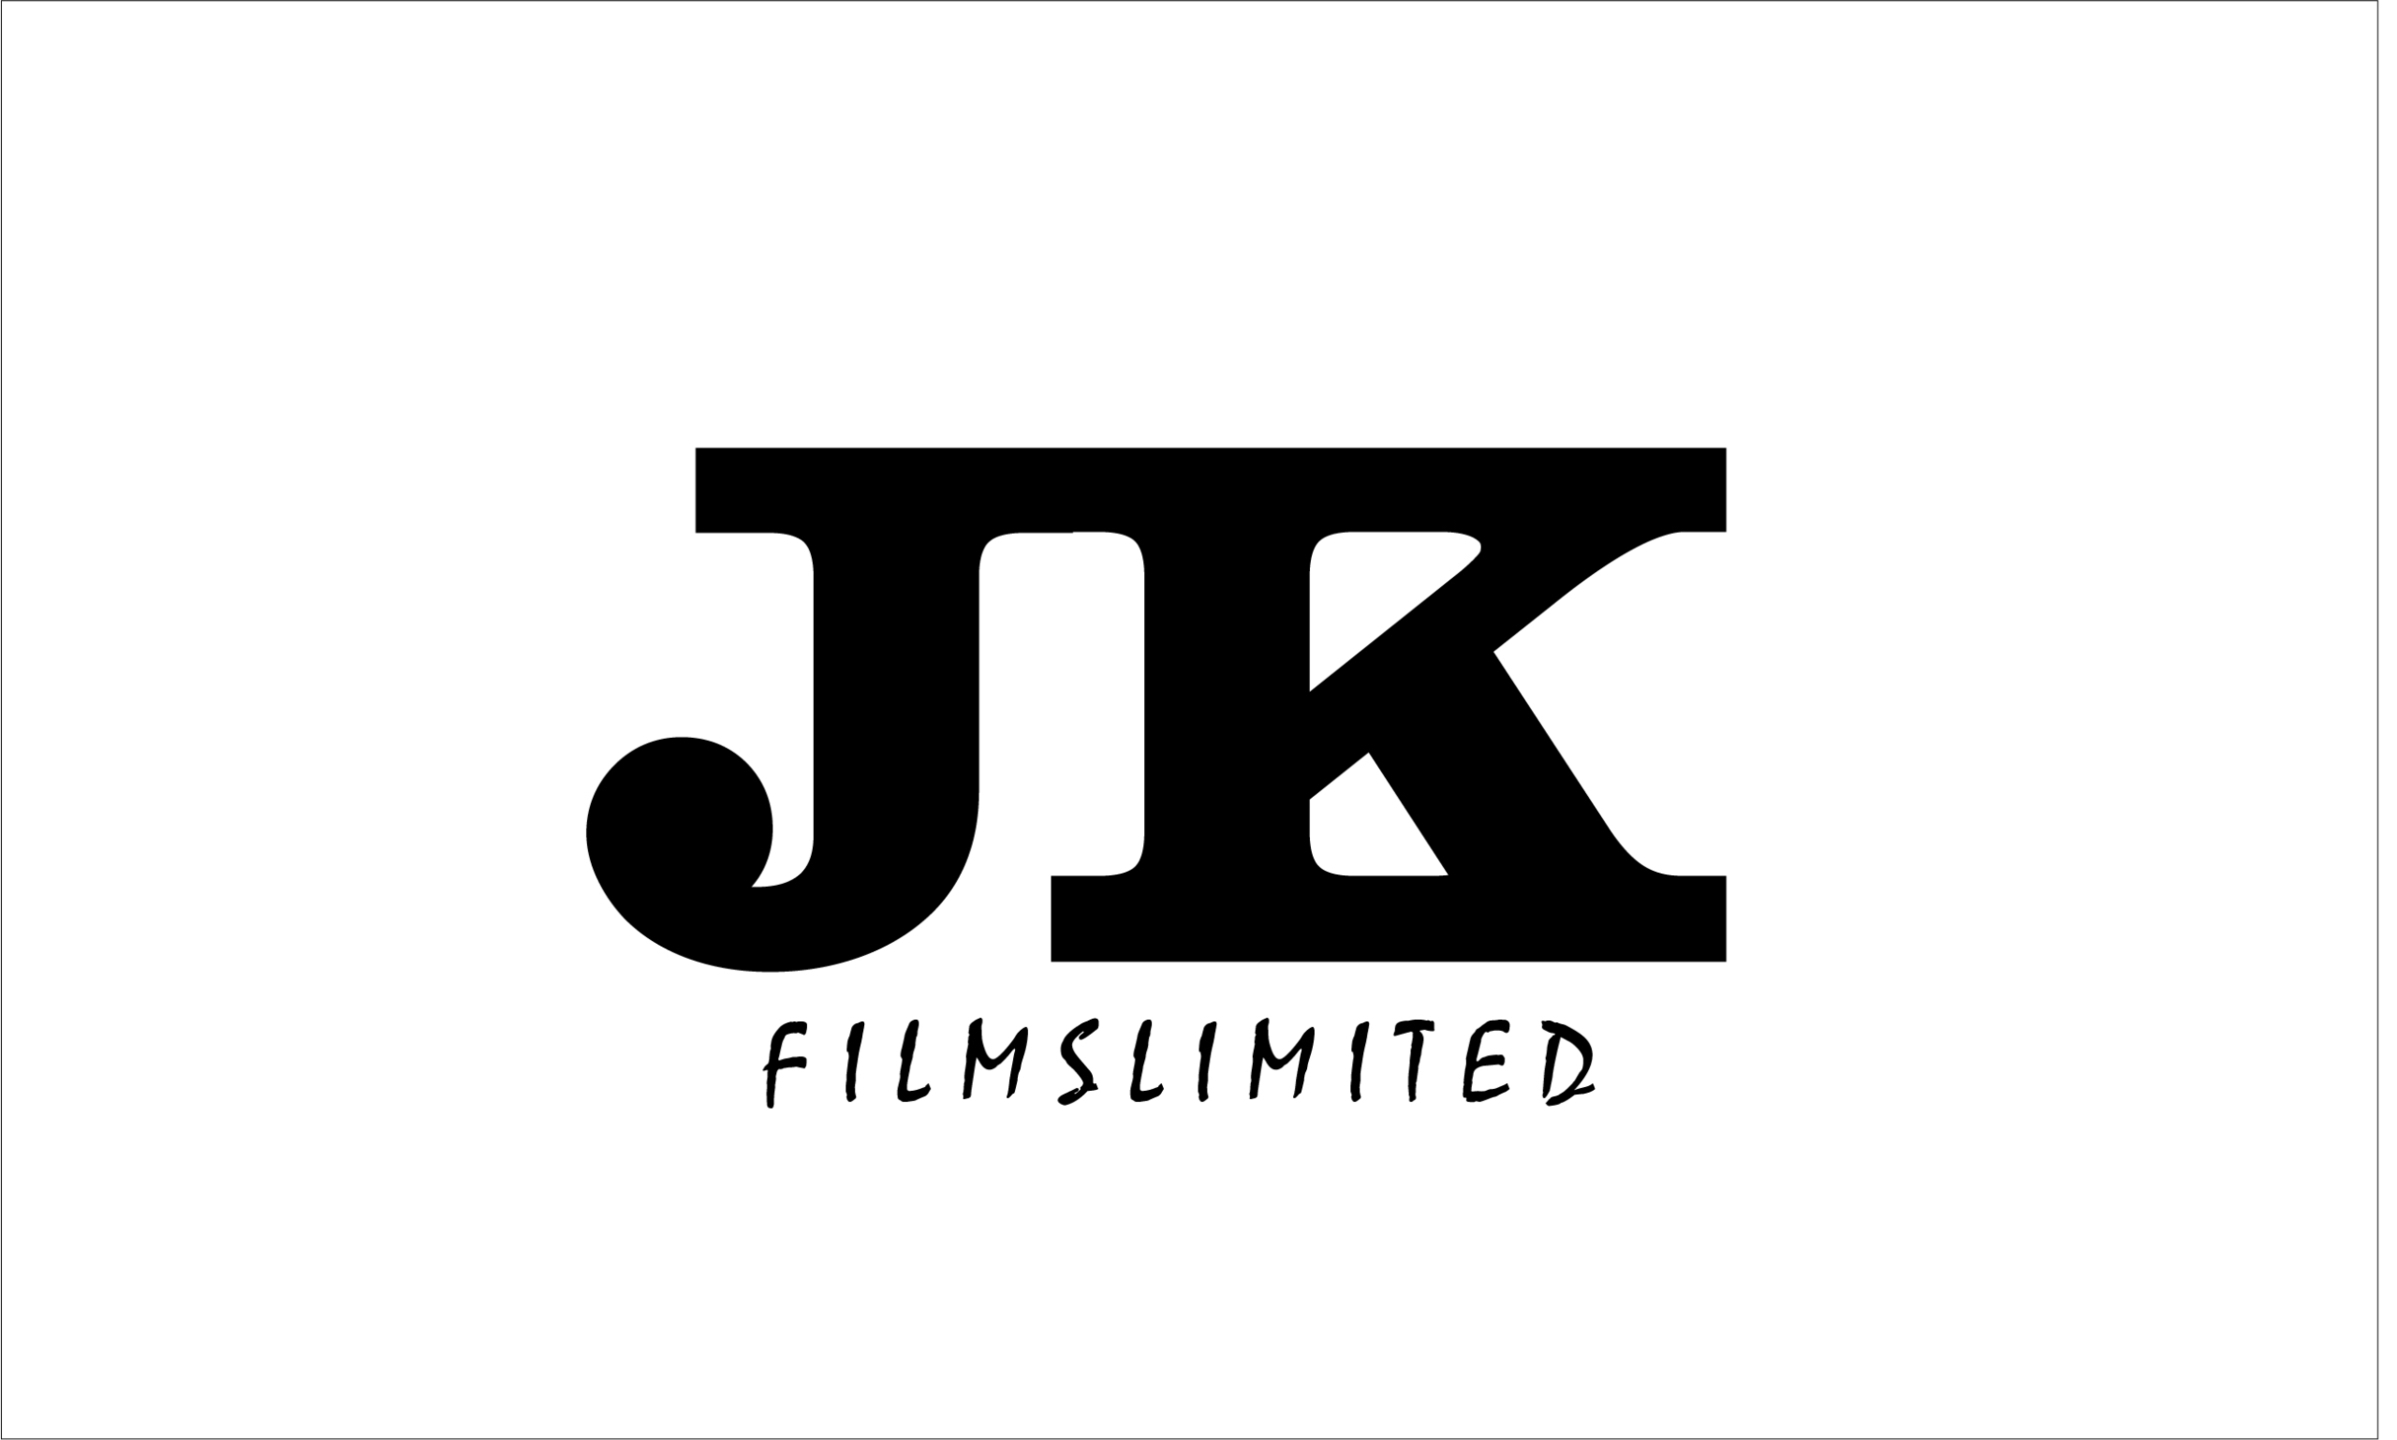 Josh Lam (@jkfilmslimited) Cover Image